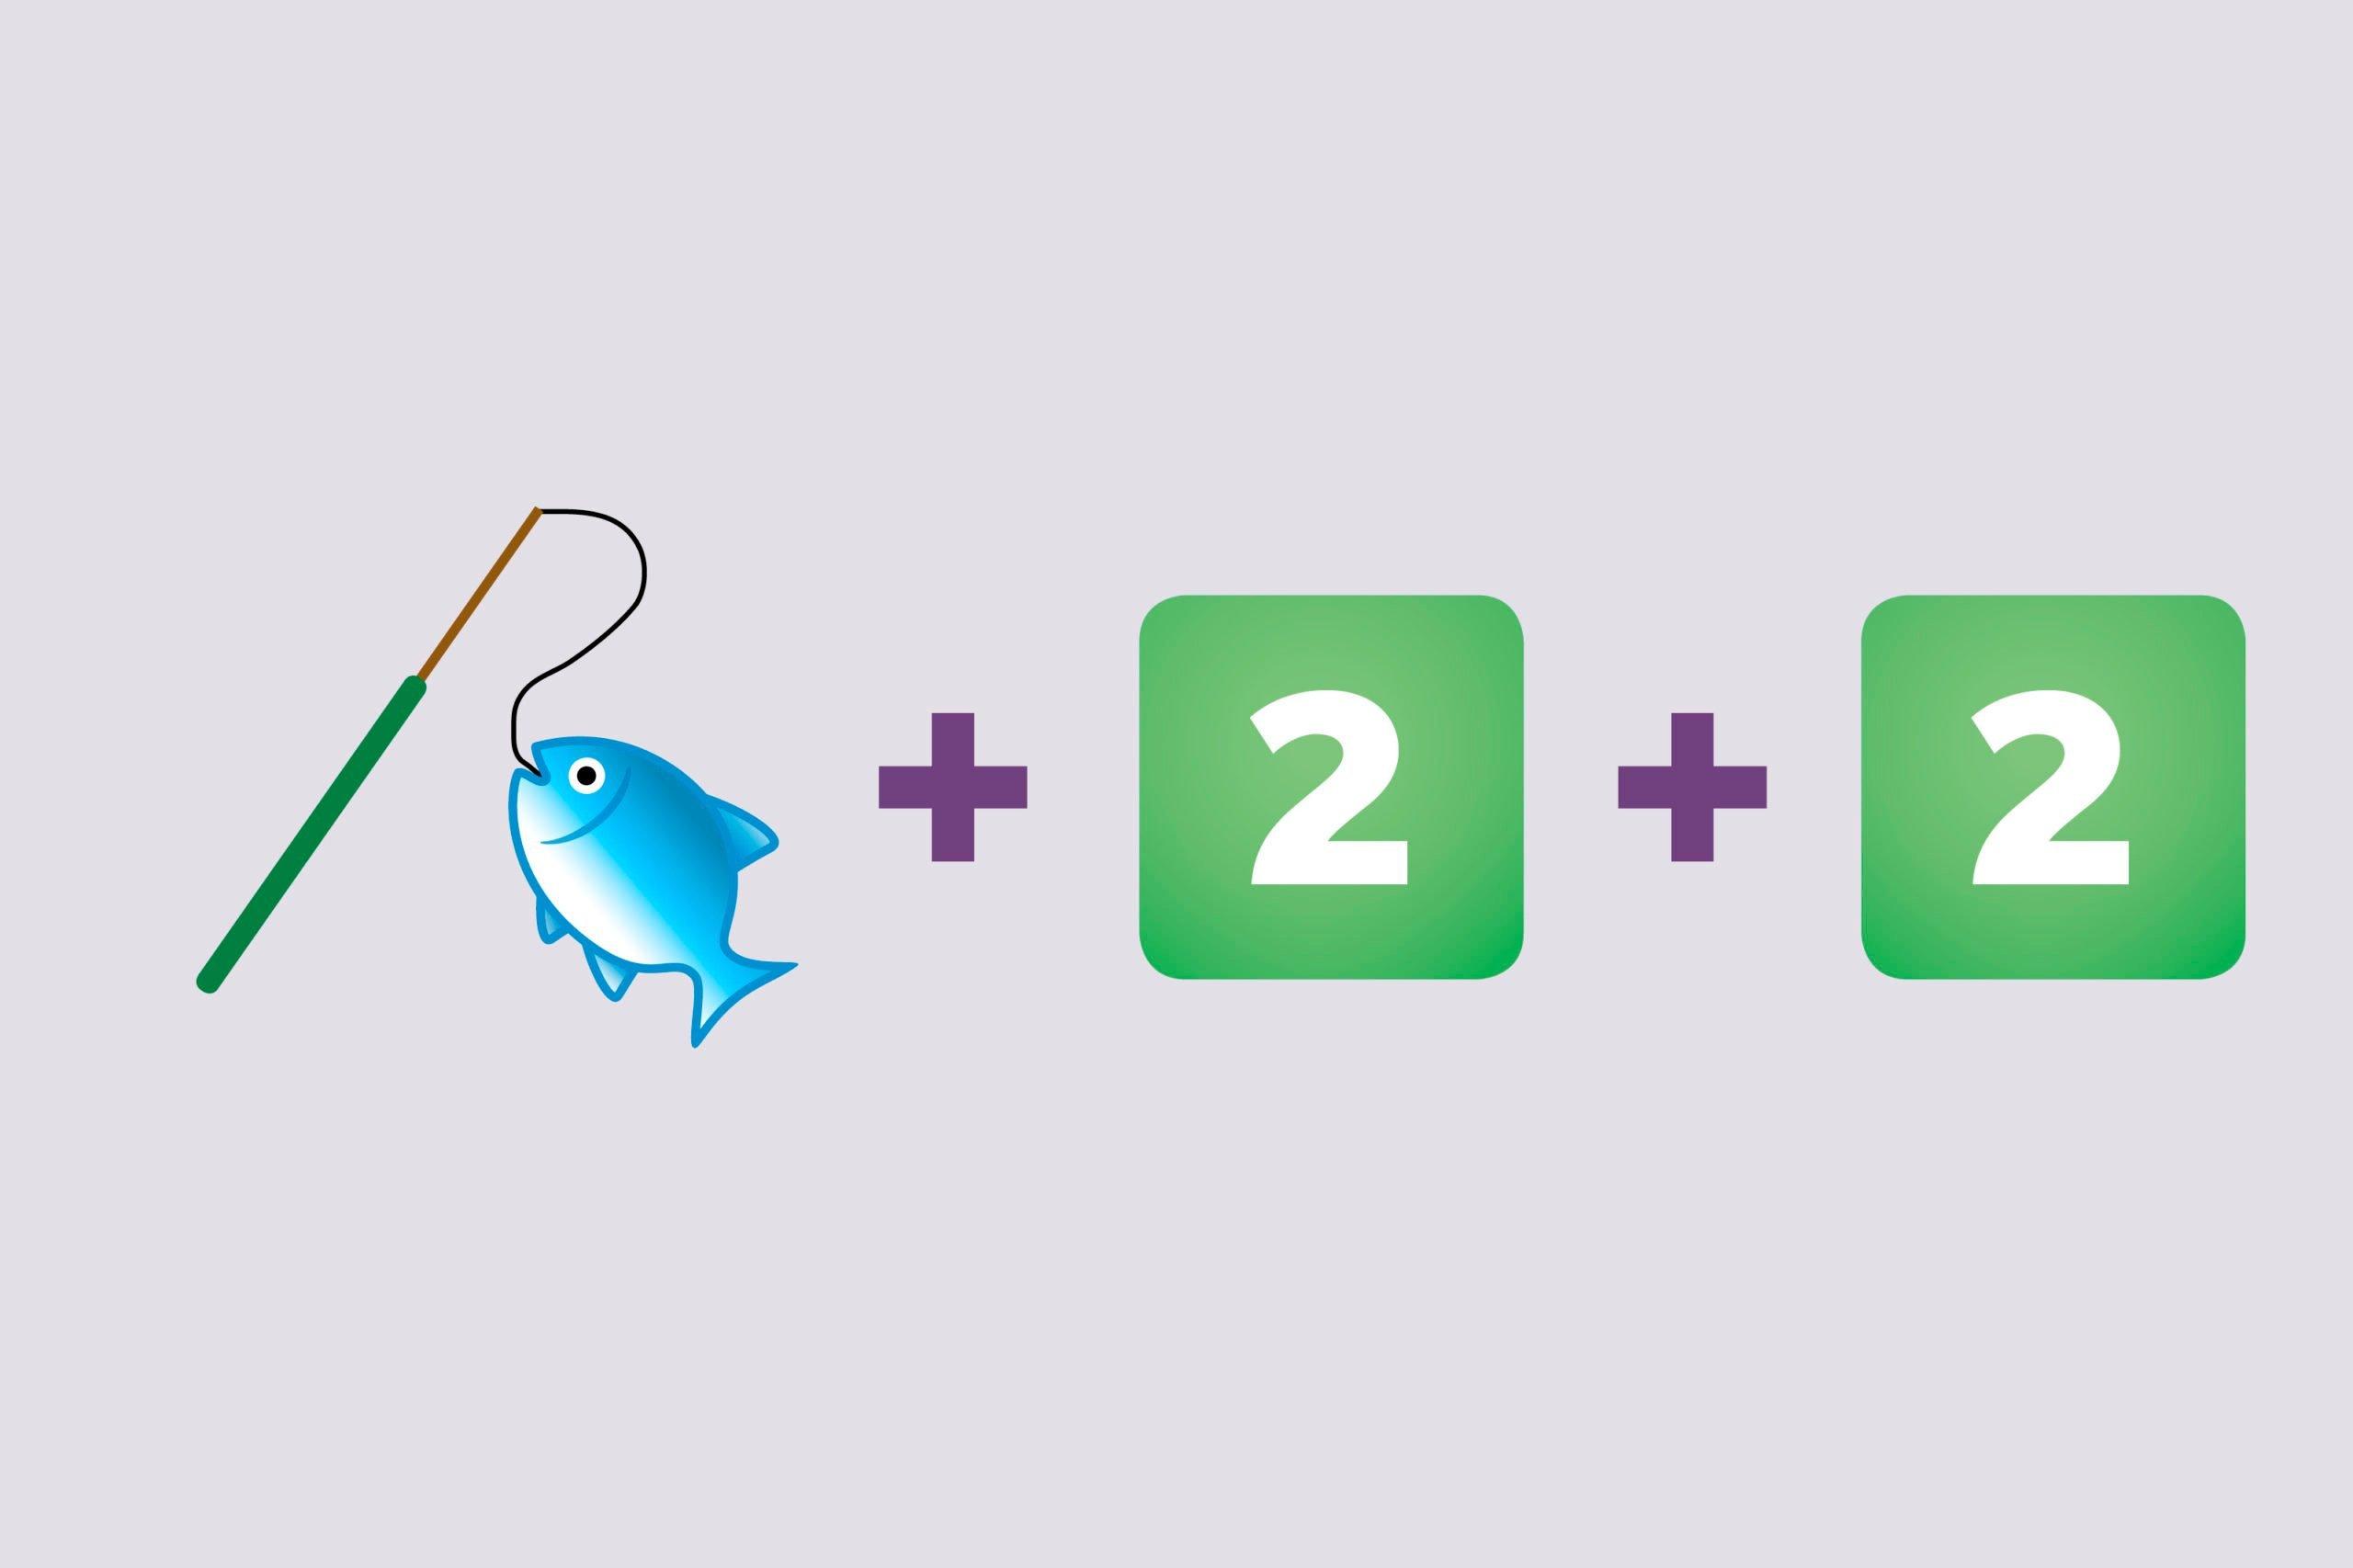 Fishing emoji + Number 2 emoji (twice)